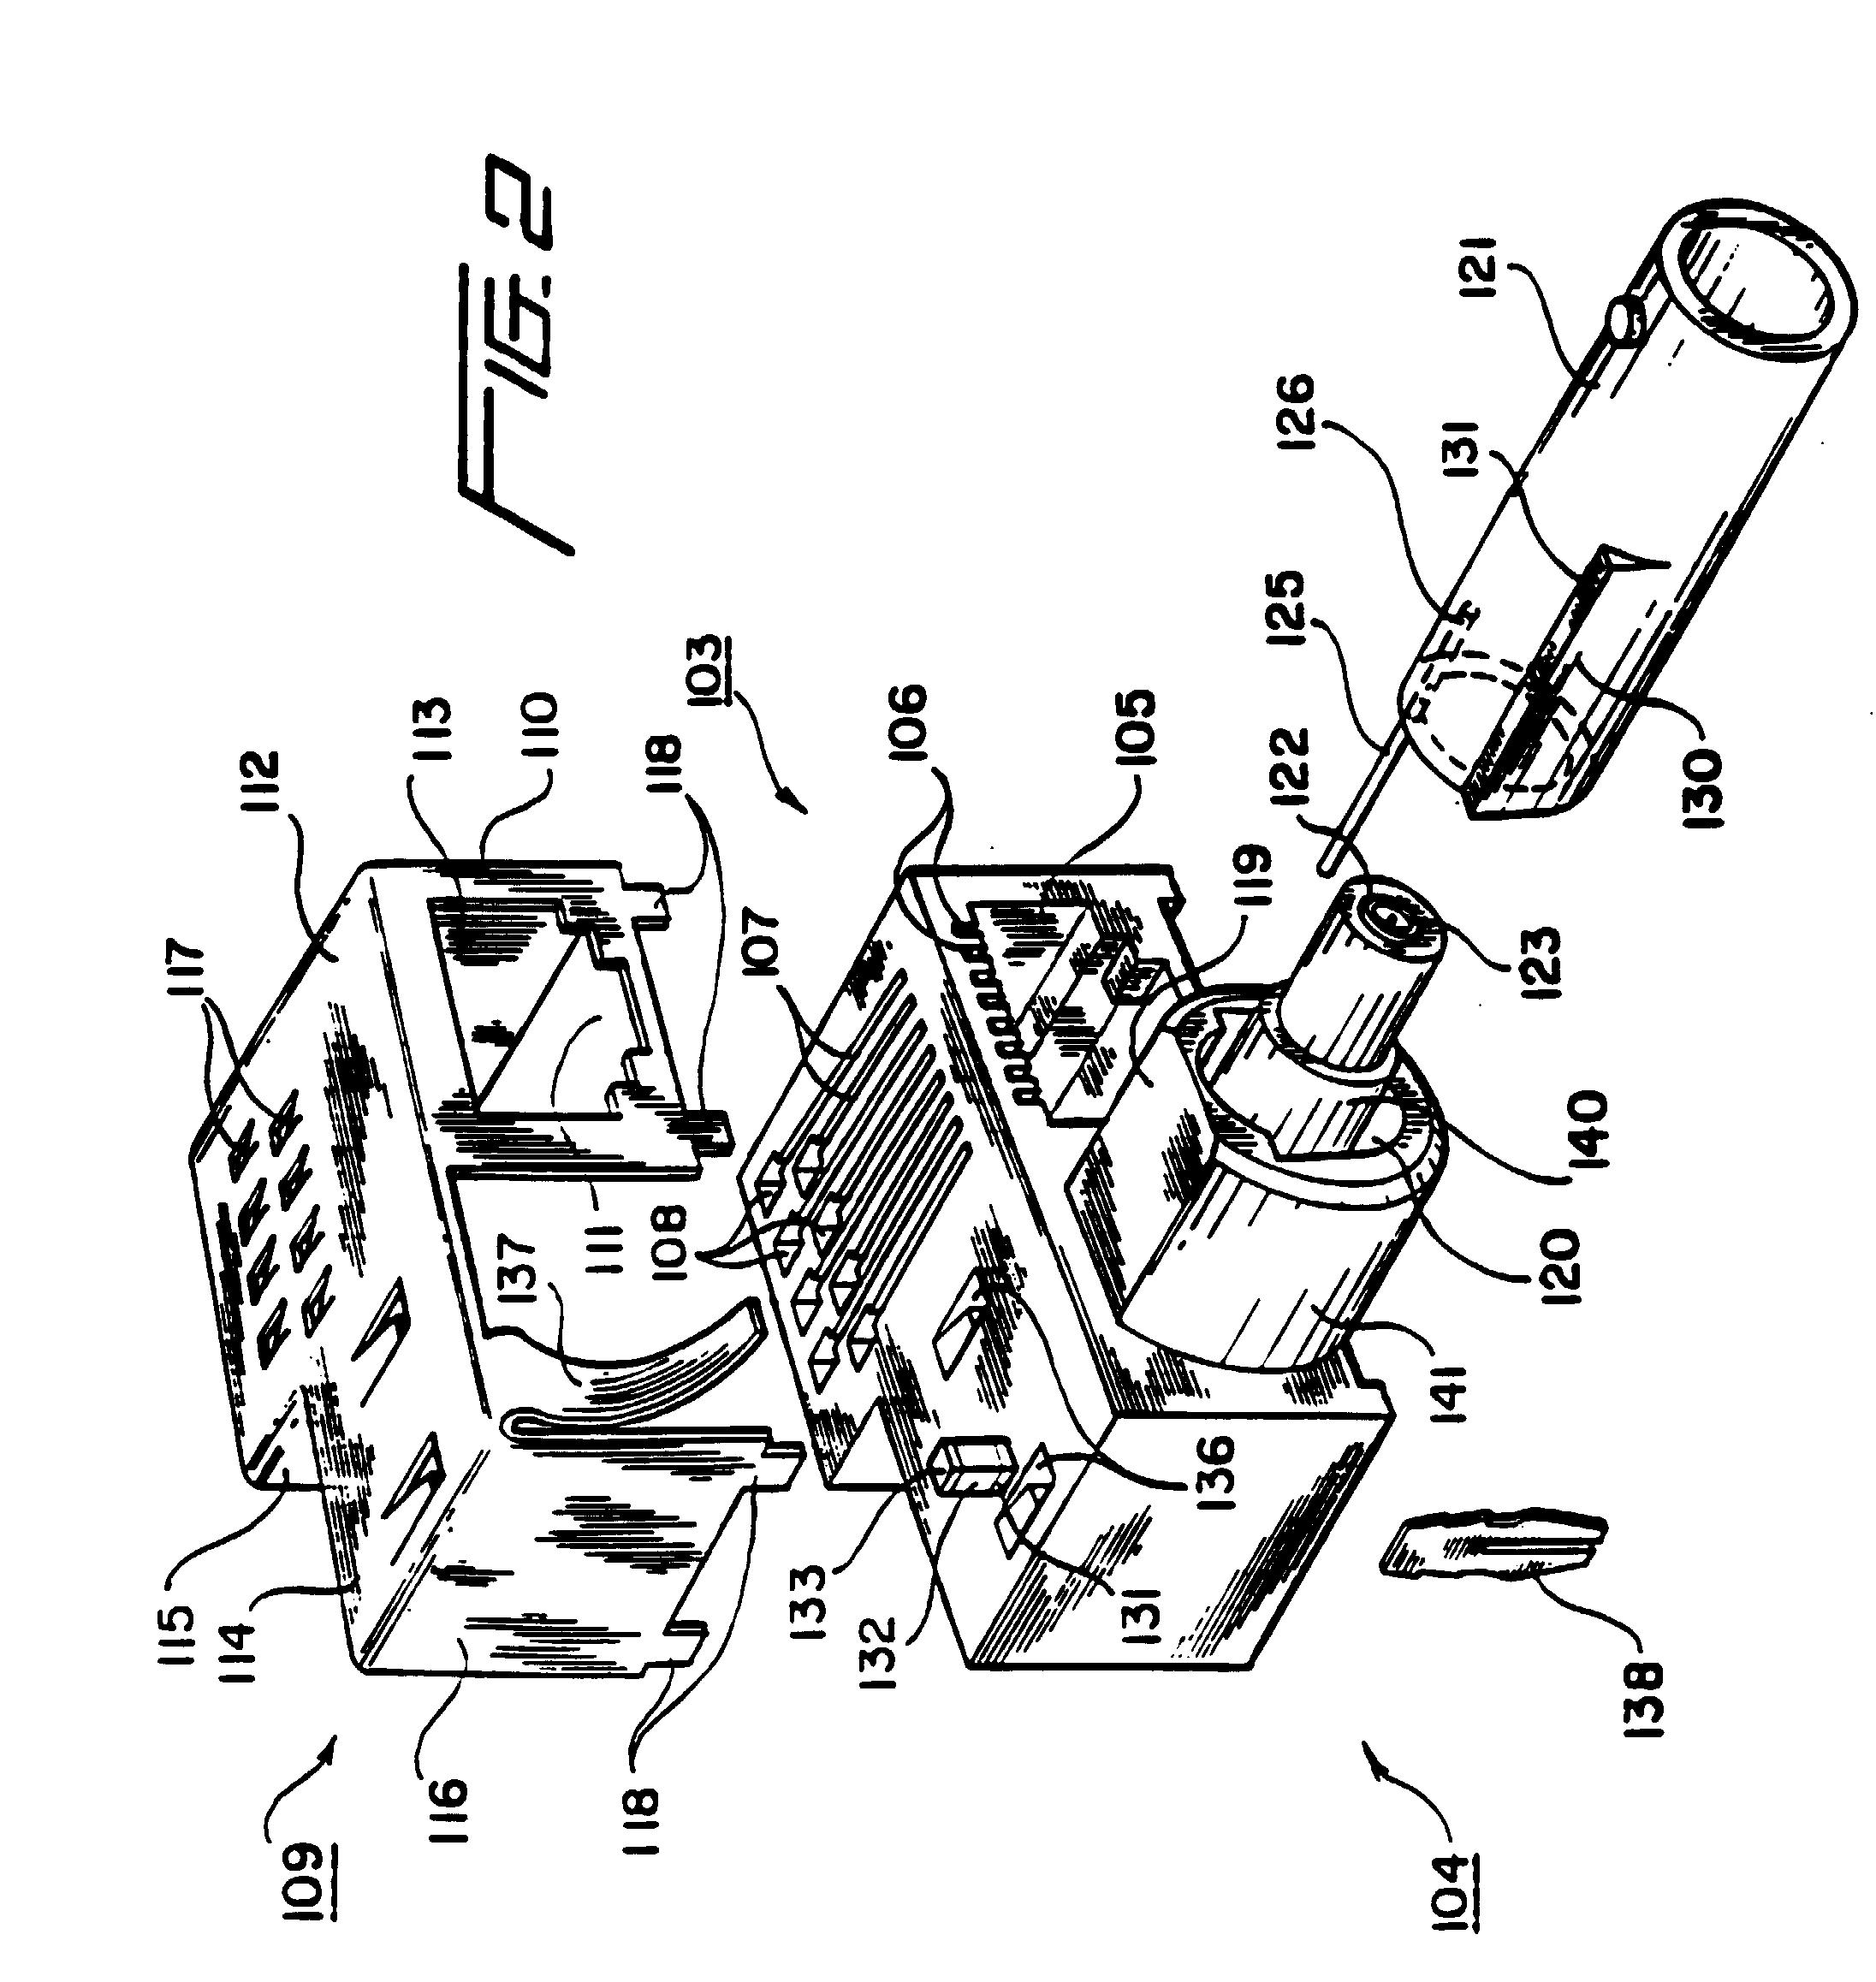 2002 bmw 325i radio wiring diagram leviton switch r1150rt fuse box auto